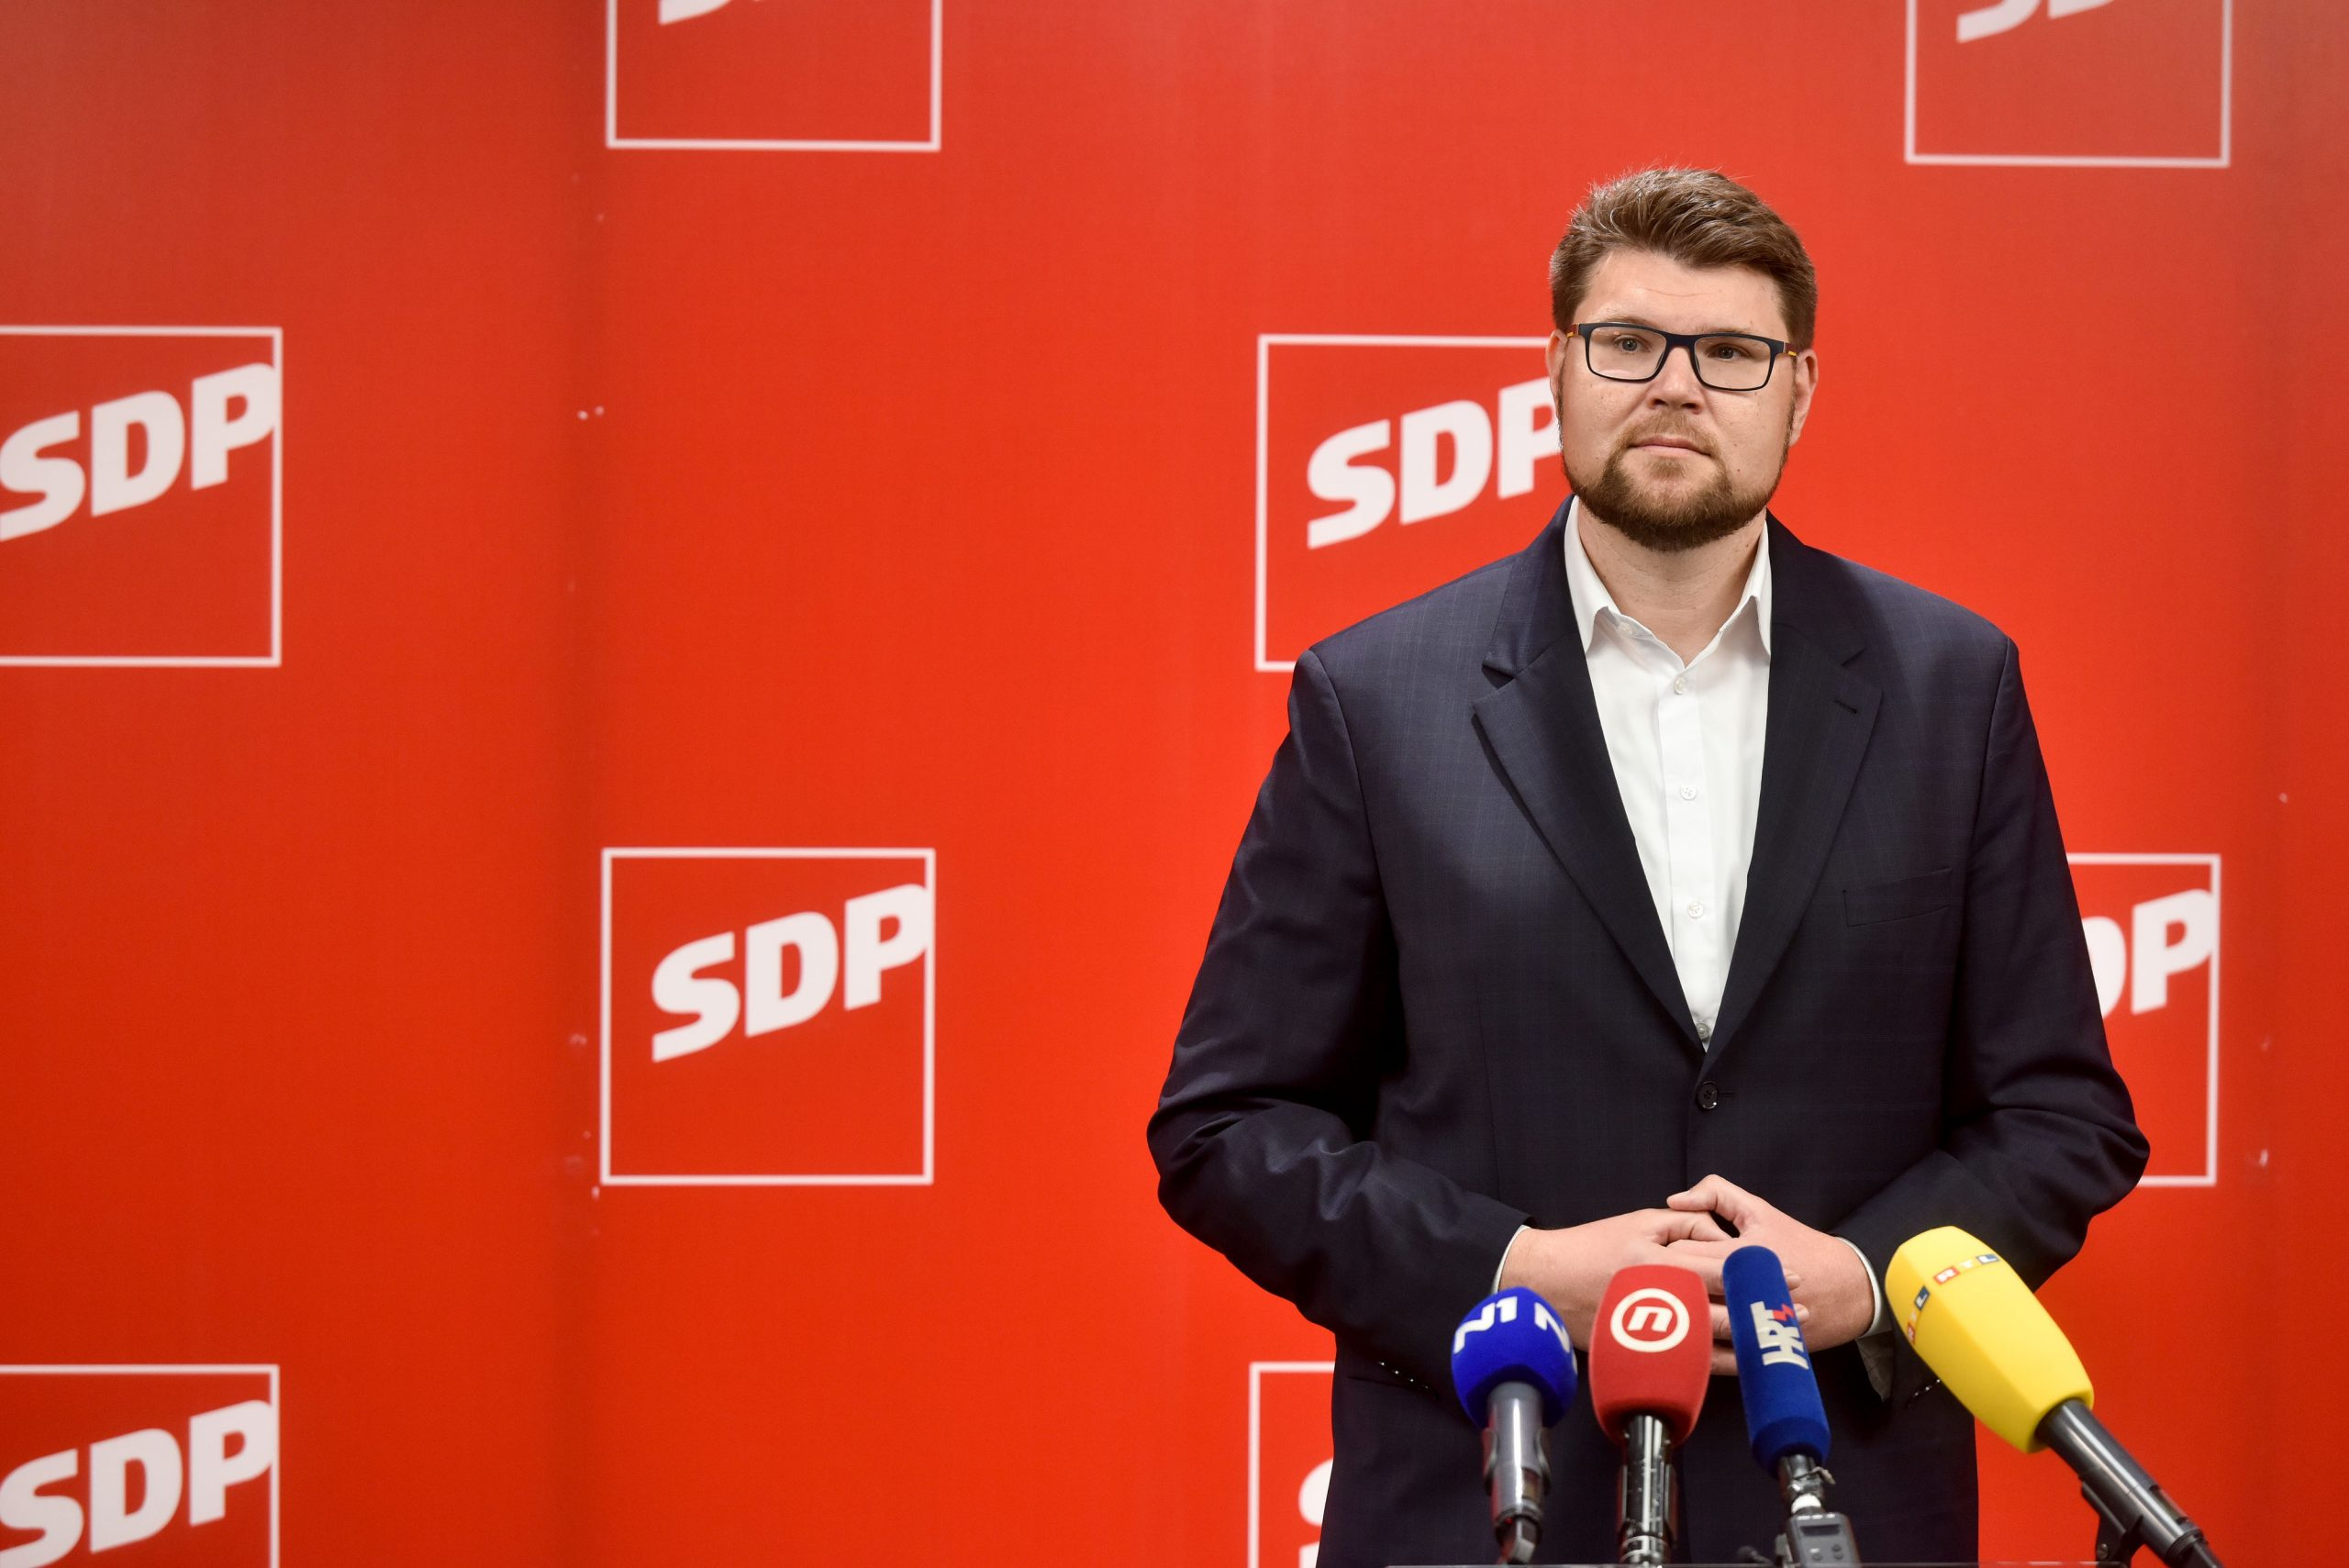 Peđa Grbin / Photo: Davorin Visnjic/PIXSELL